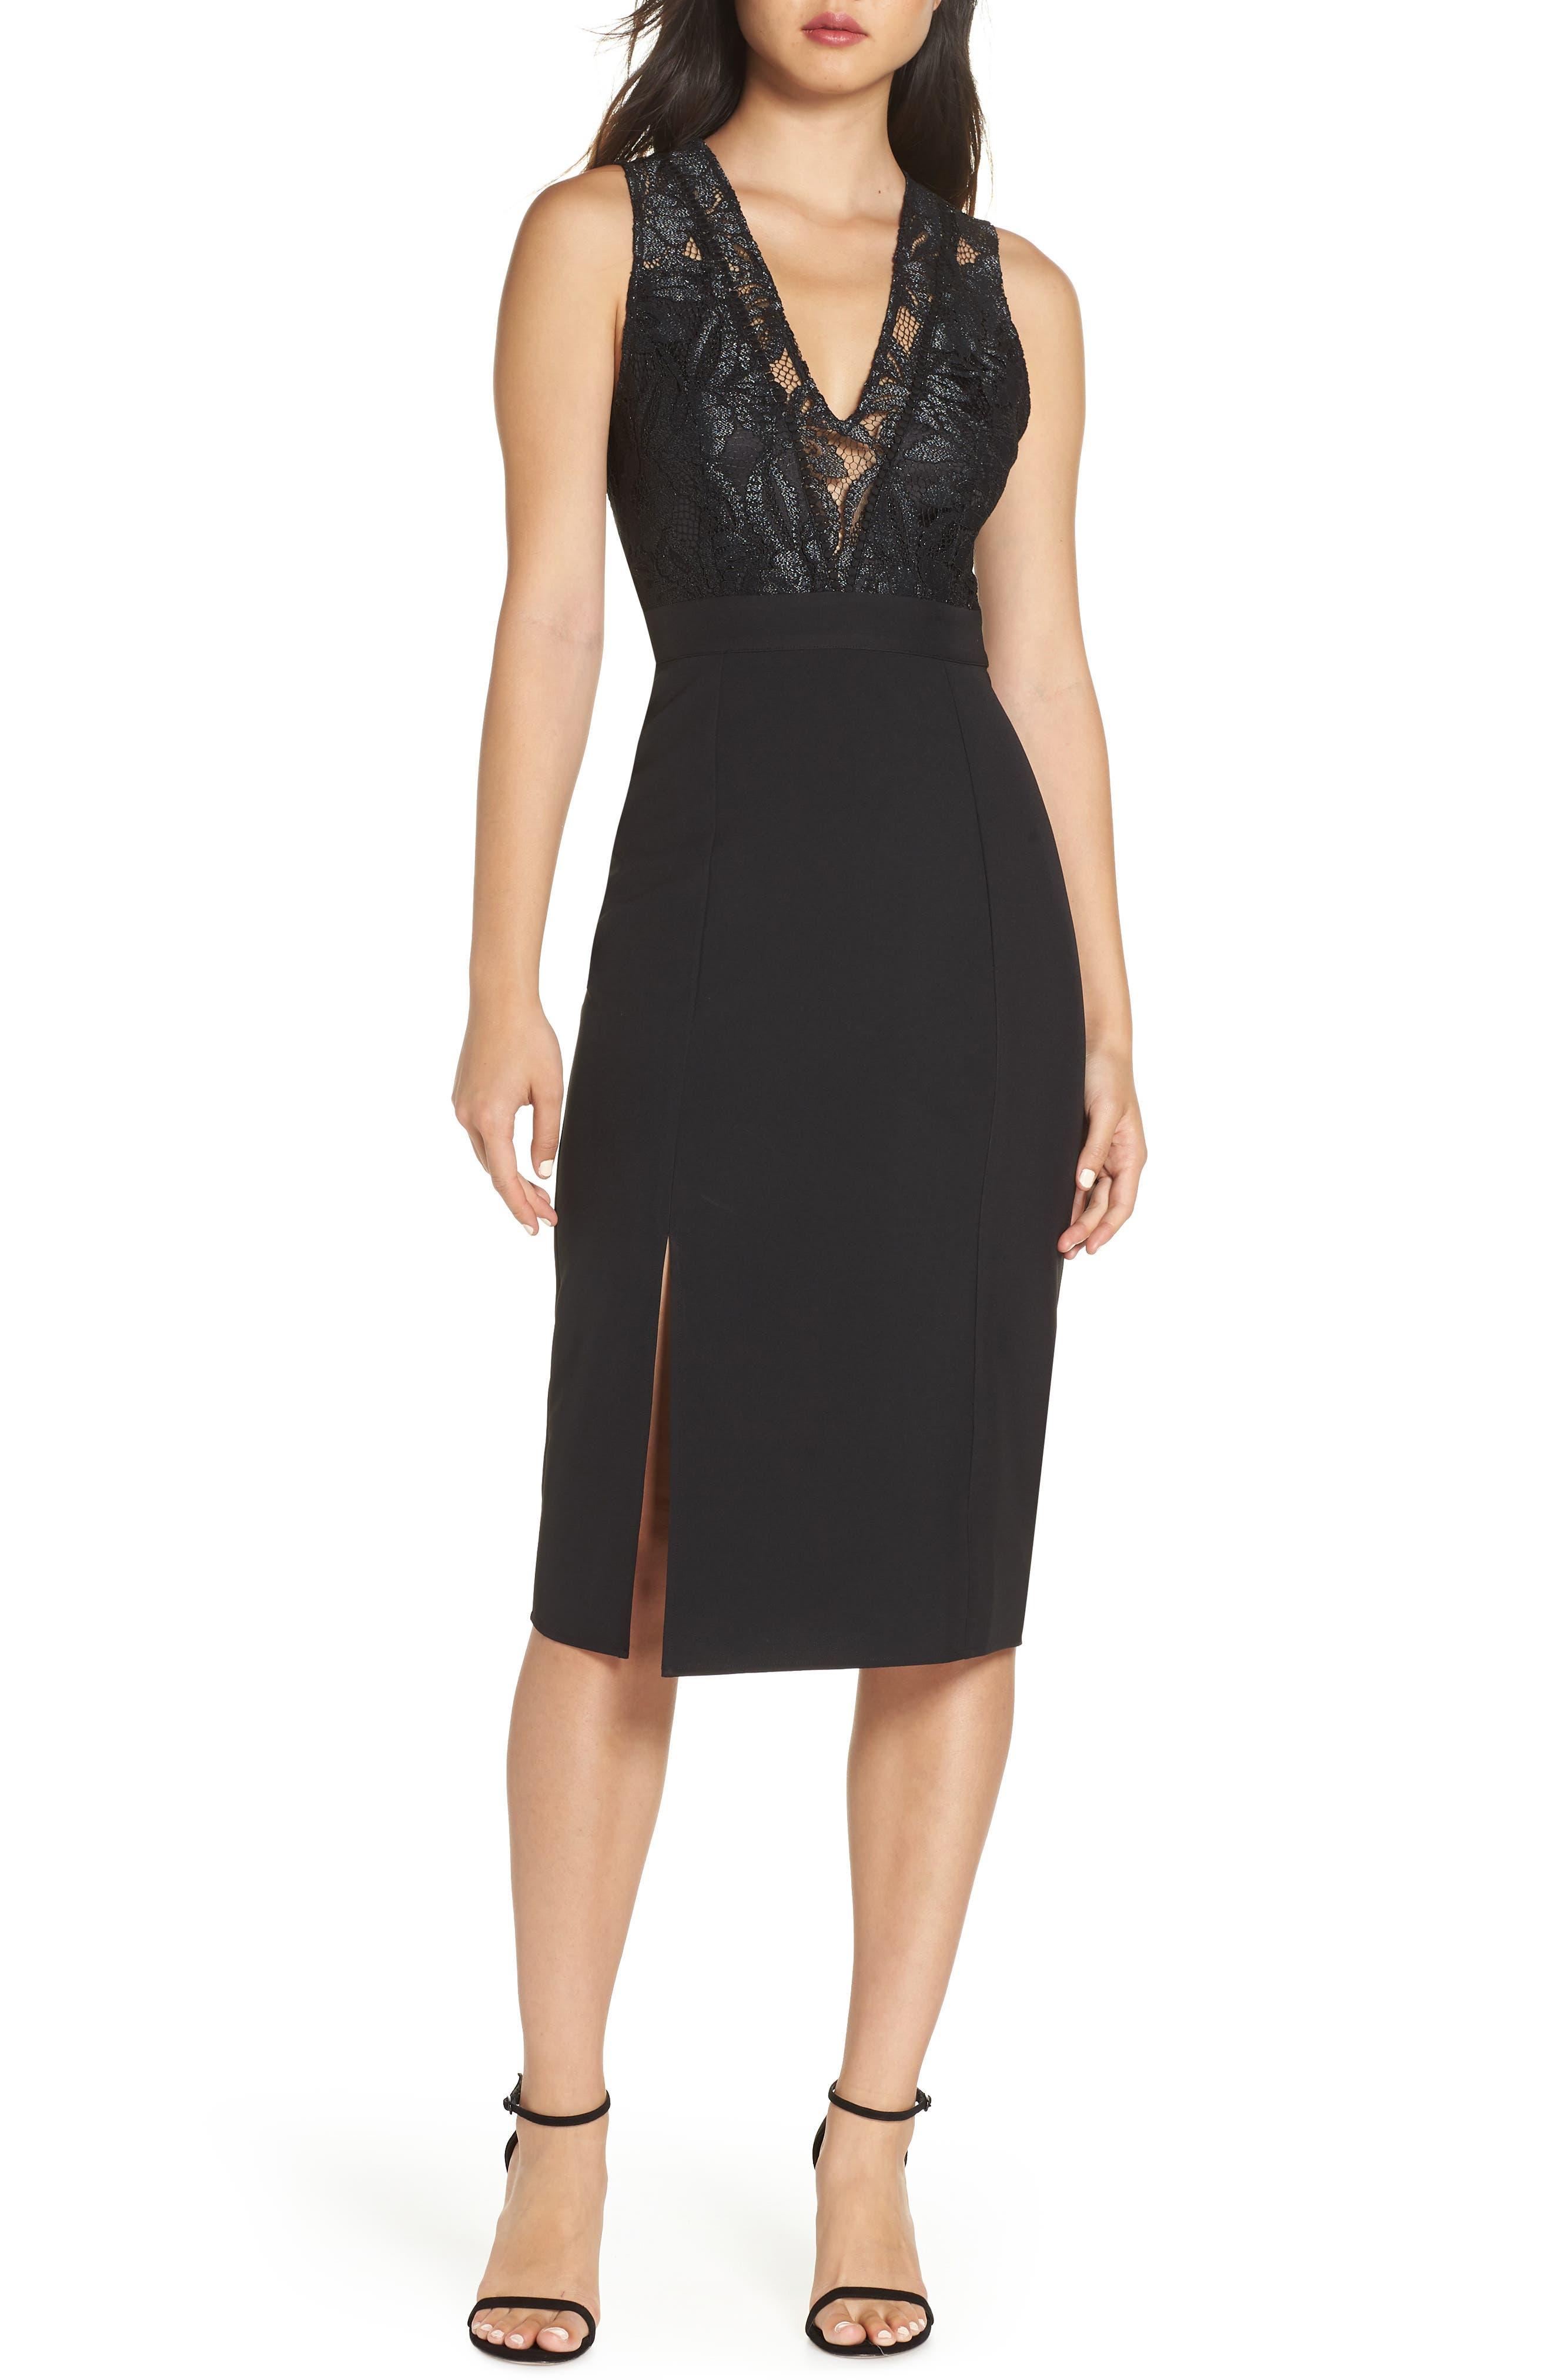 Nsr Kate V-Neck Lace Sheath Dress